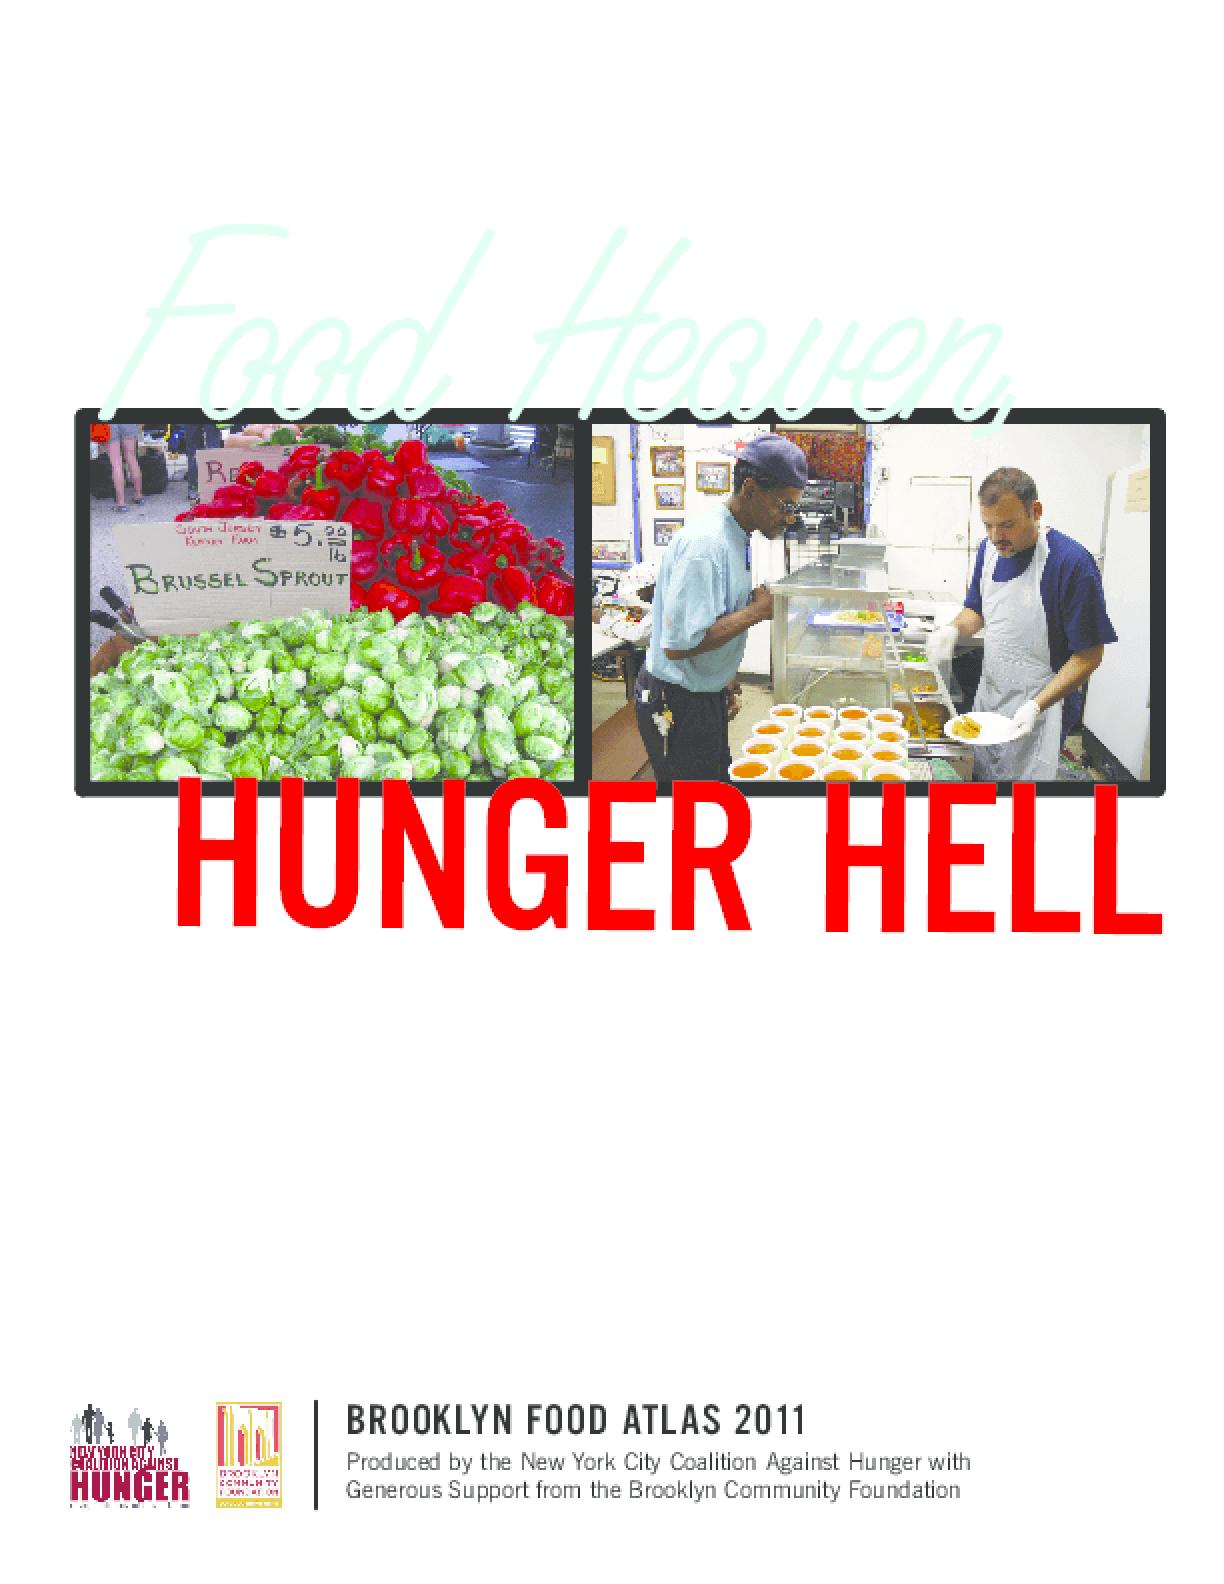 Food Heaven, Hunger Hell: Brooklyn Food Atlas 2011